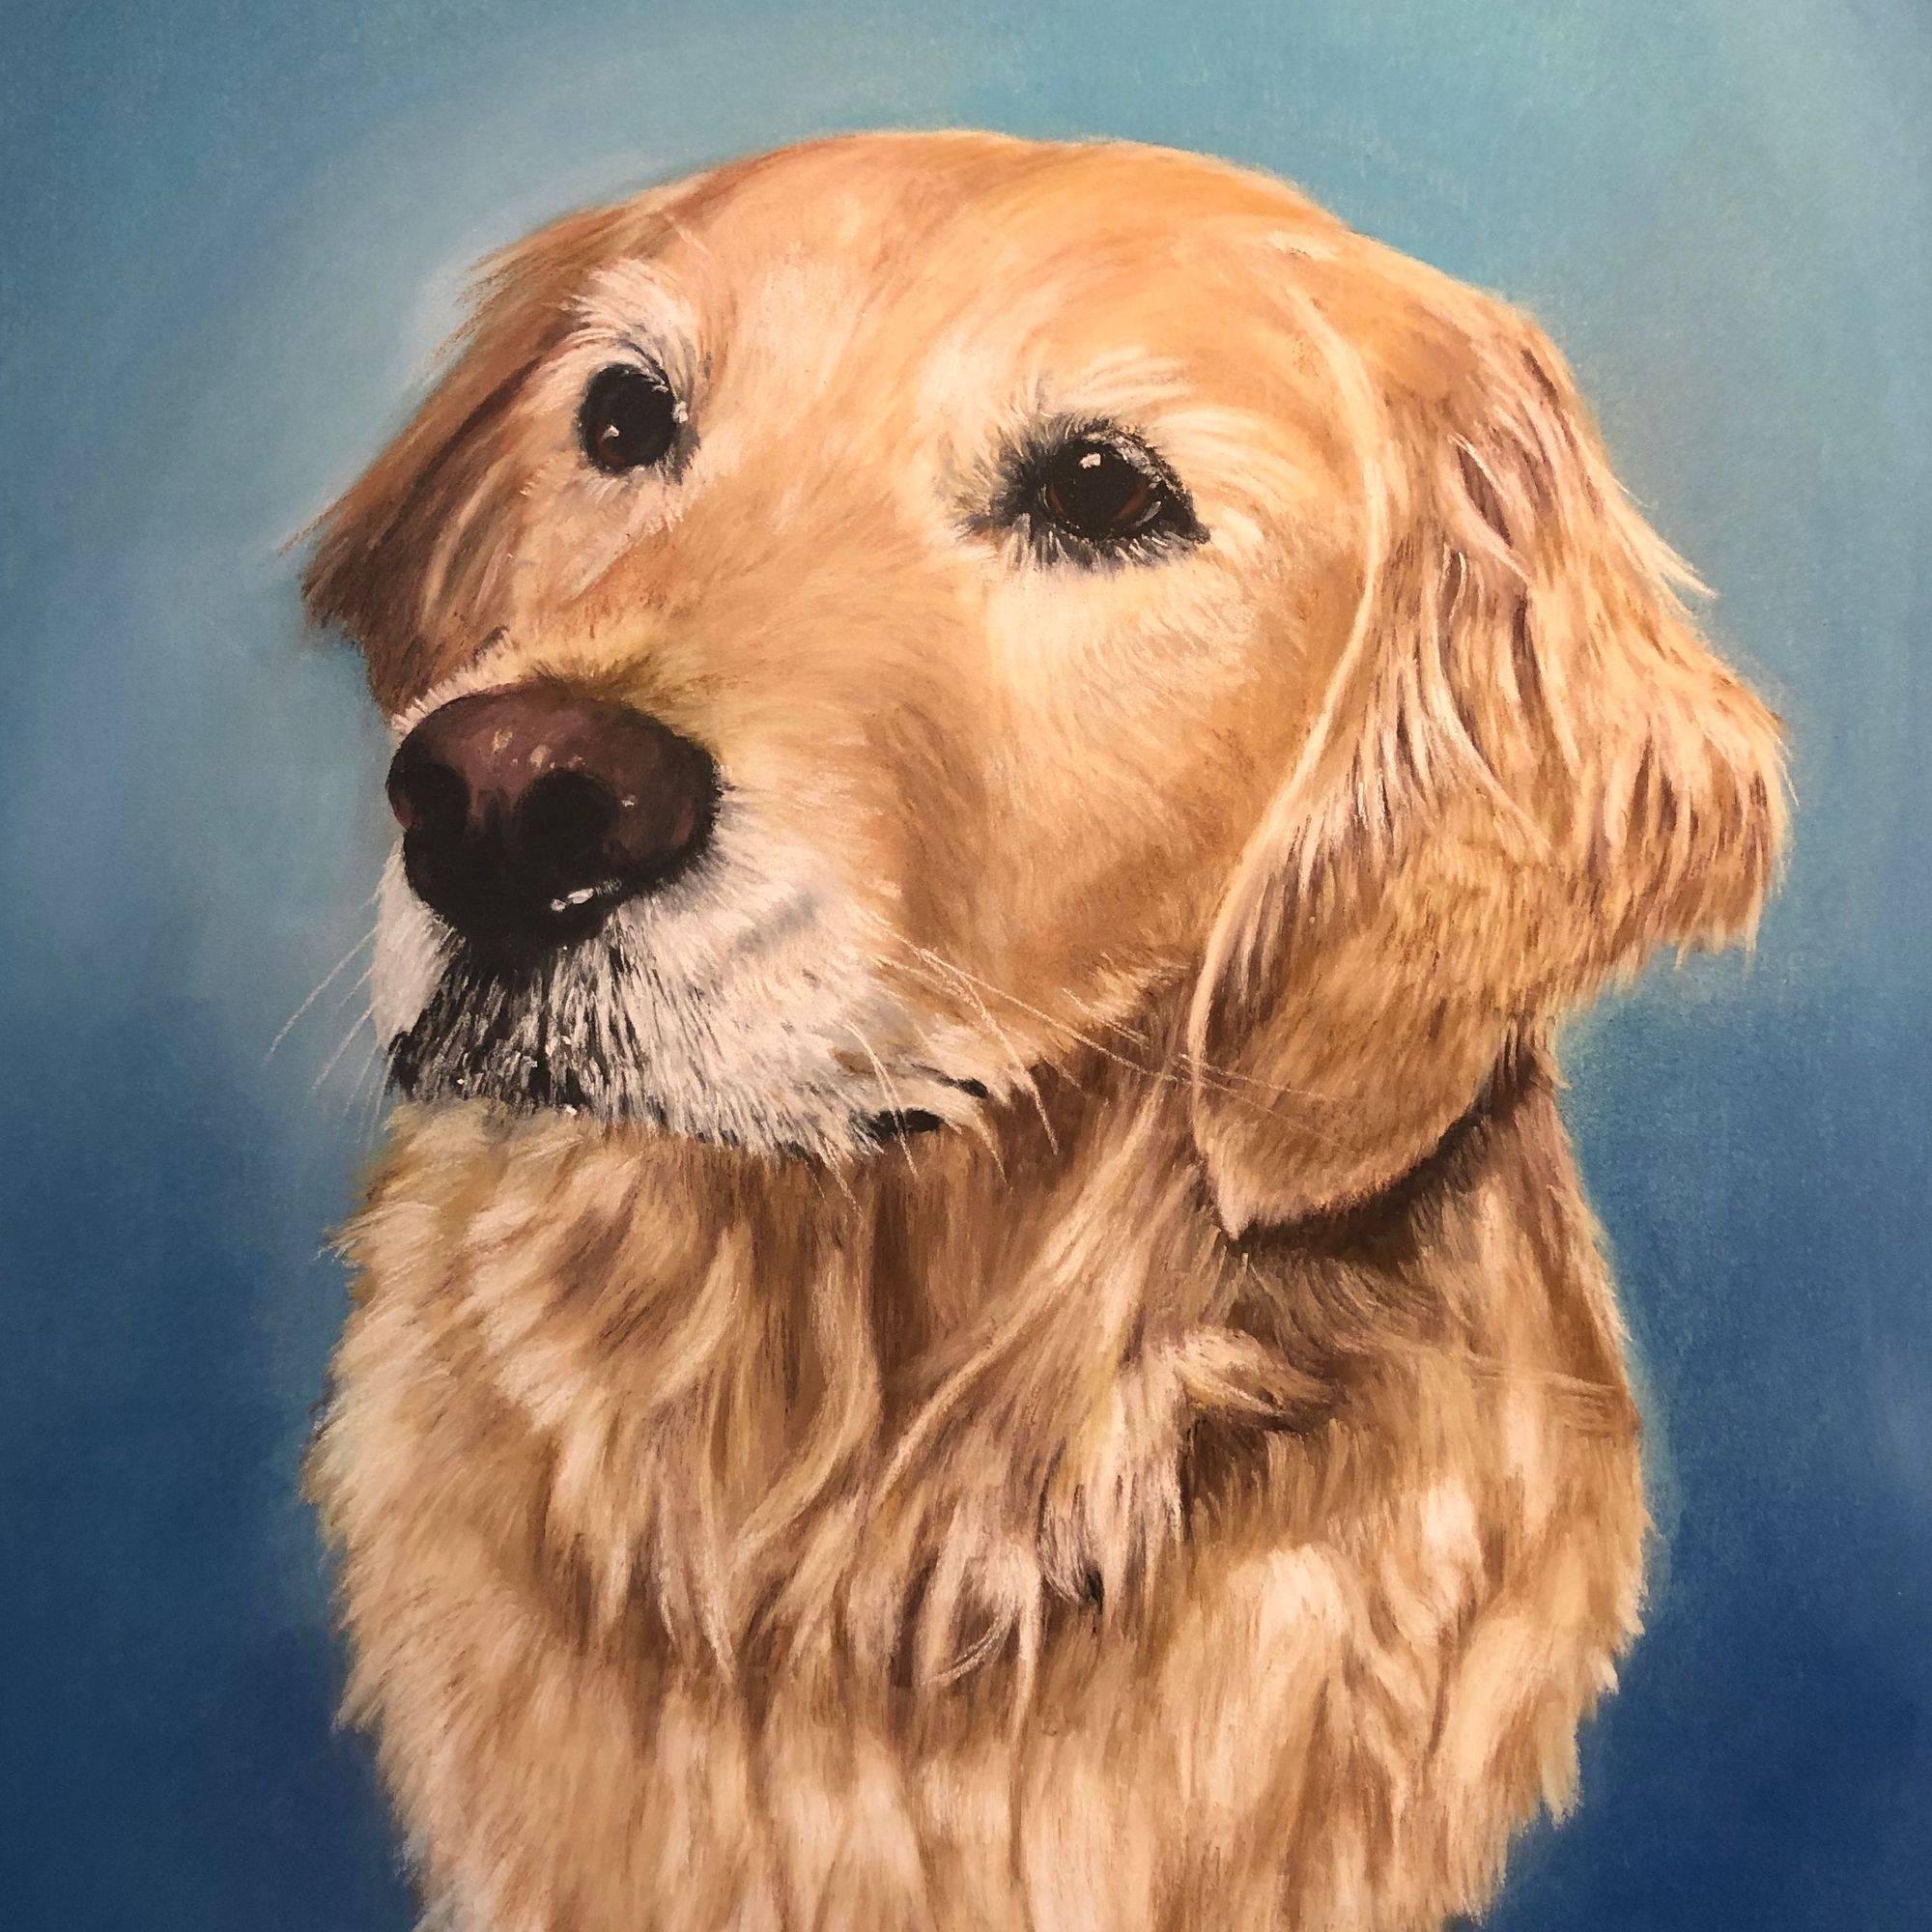 Pet Portraits by Joe Brewer